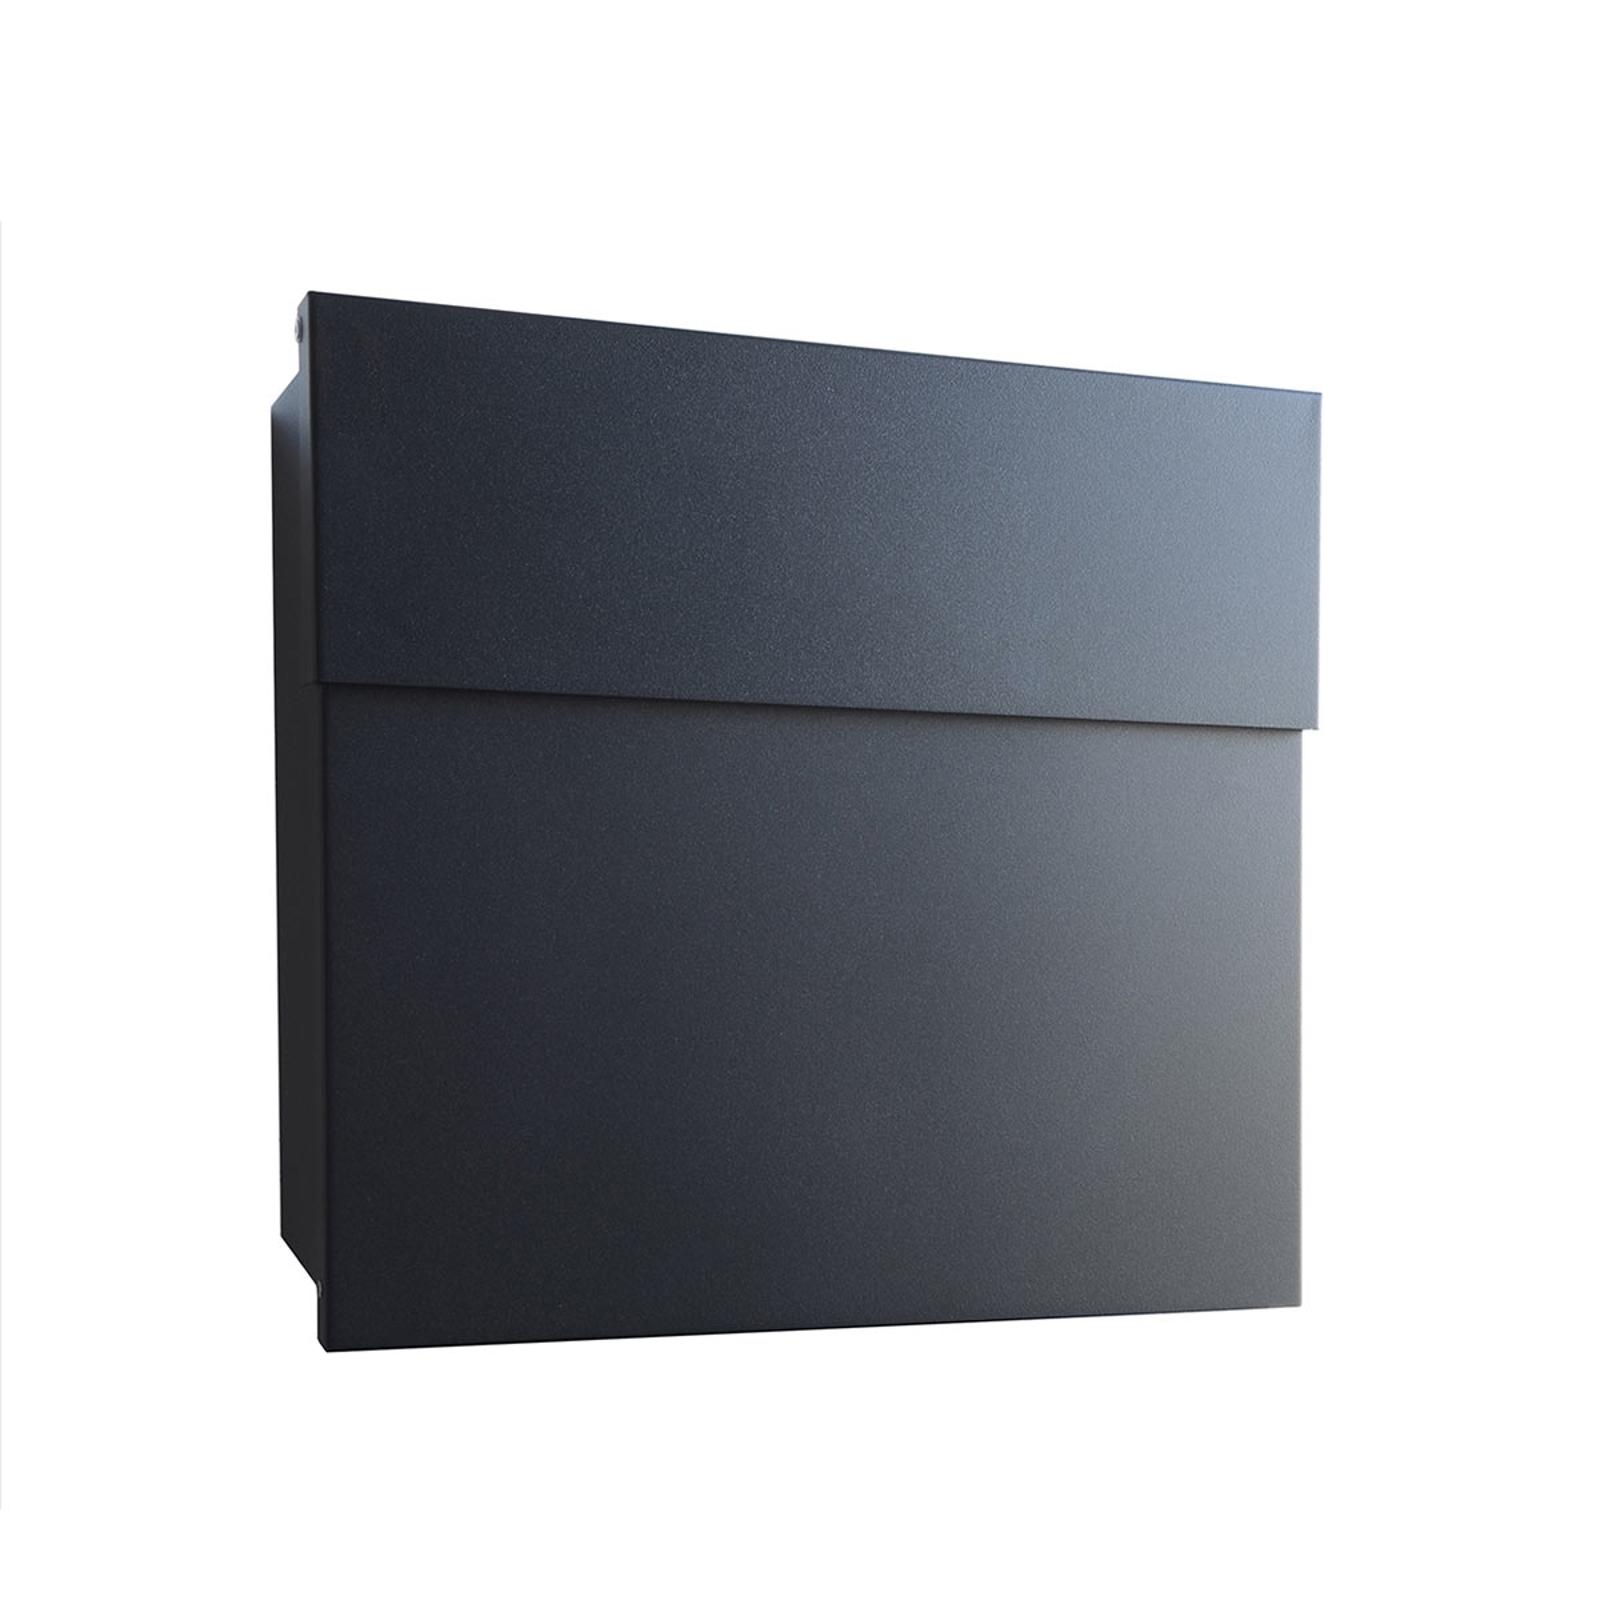 Design-brievenbus Letterman IV, zwart